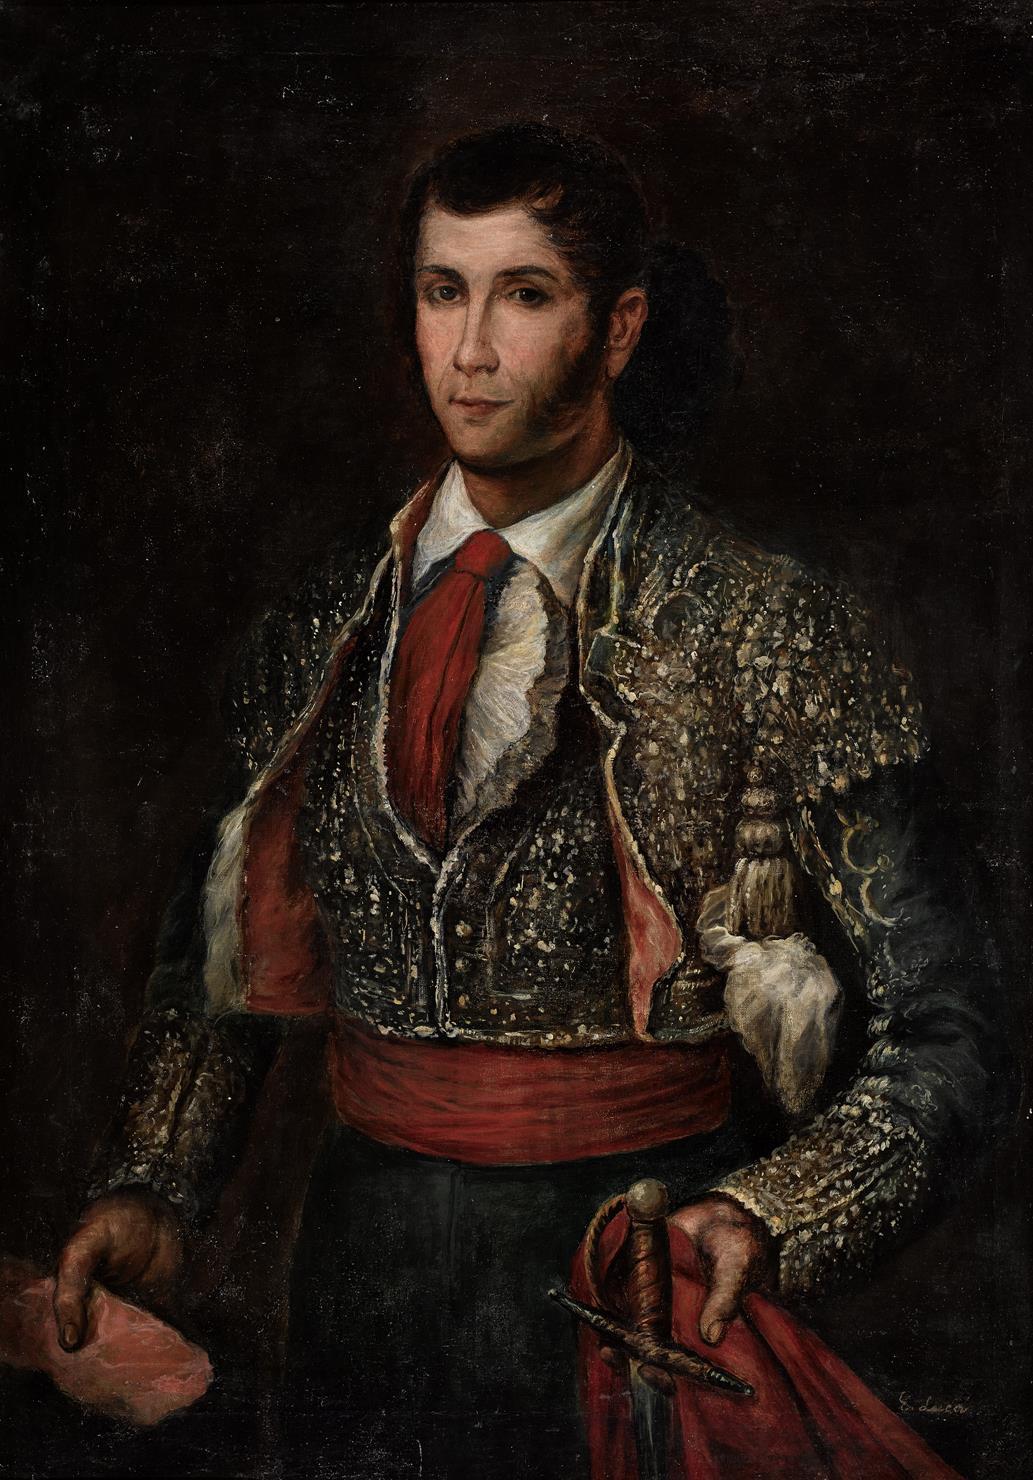 El torero Paquiro (2020) - Eugenio Lucas Villamil